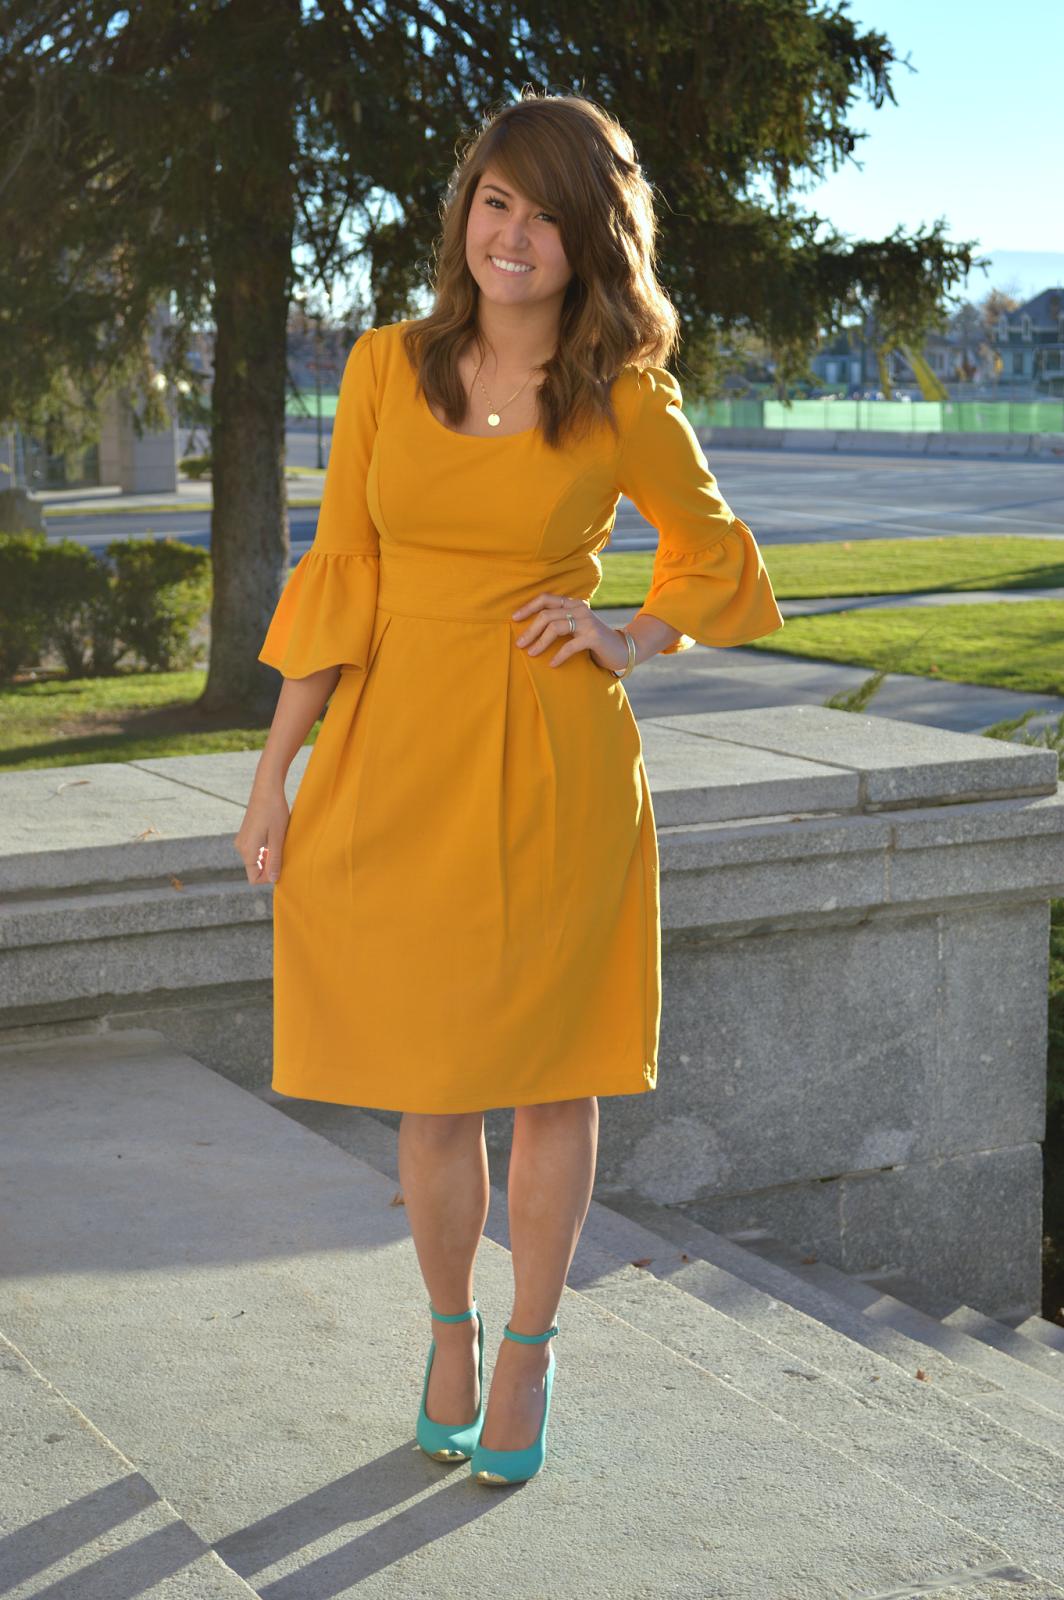 Pin By Loreotravez On Fashion Inspiration Dresses Fashion Yellow Dress [ 1600 x 1064 Pixel ]